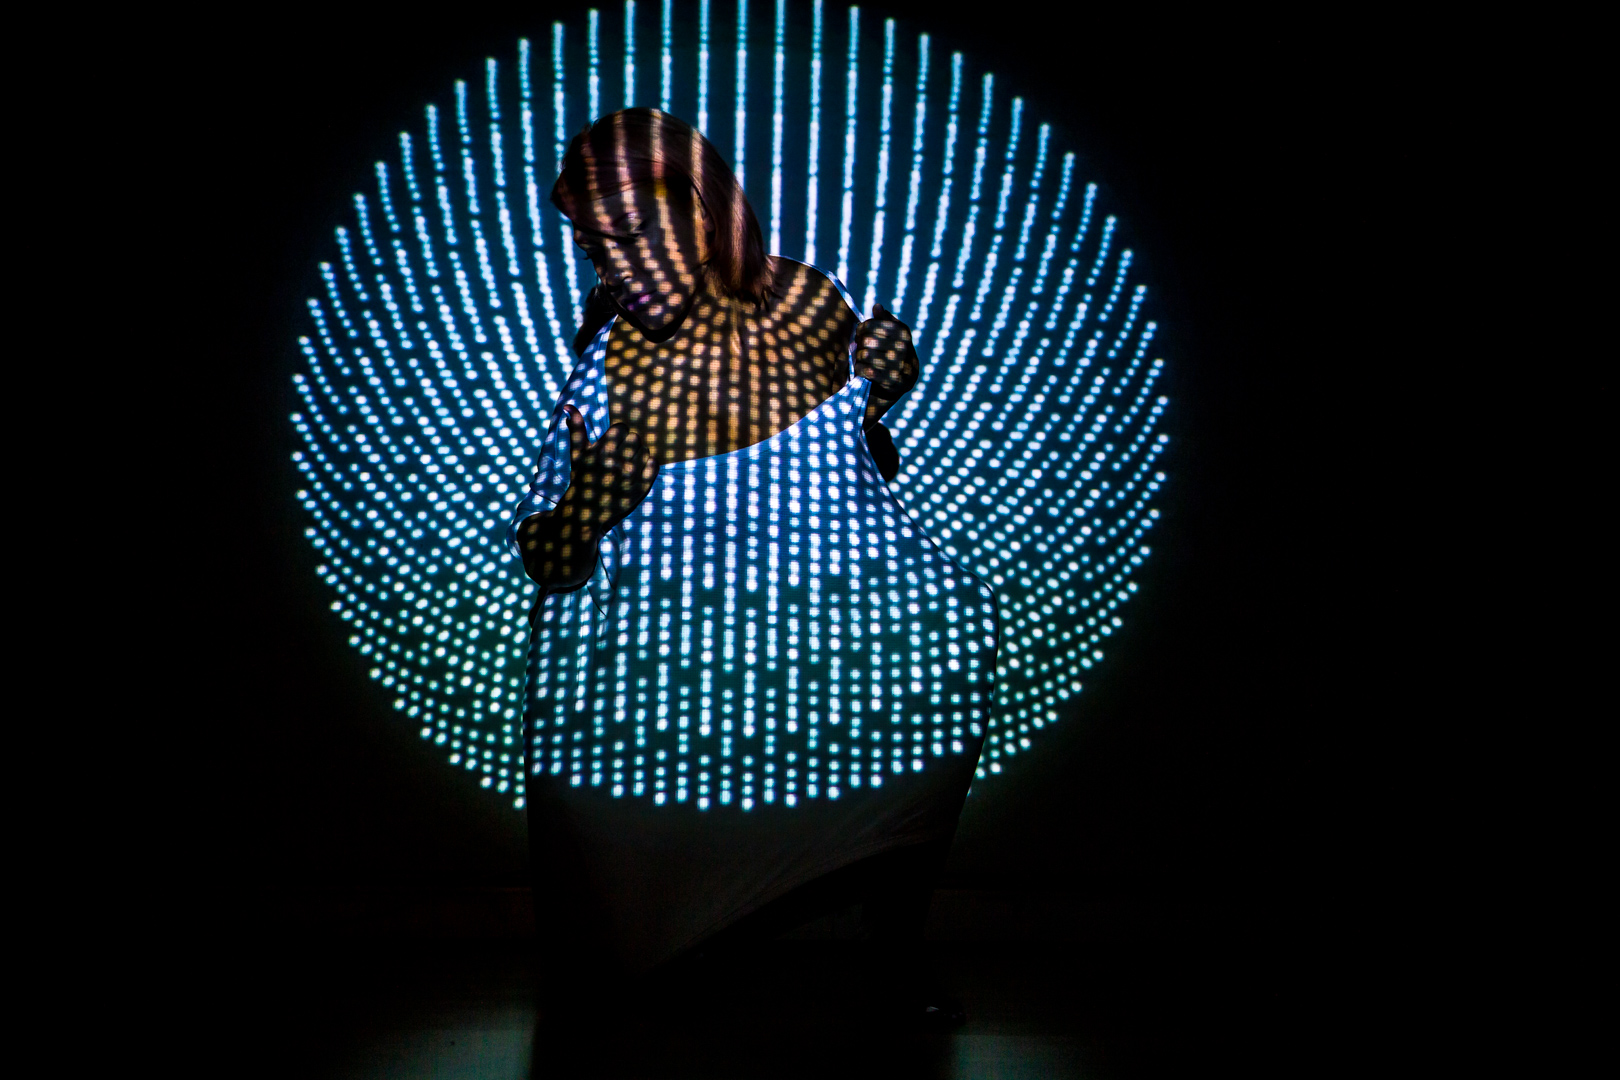 Nilda Ayala video mapping antipose Visuales Nidra